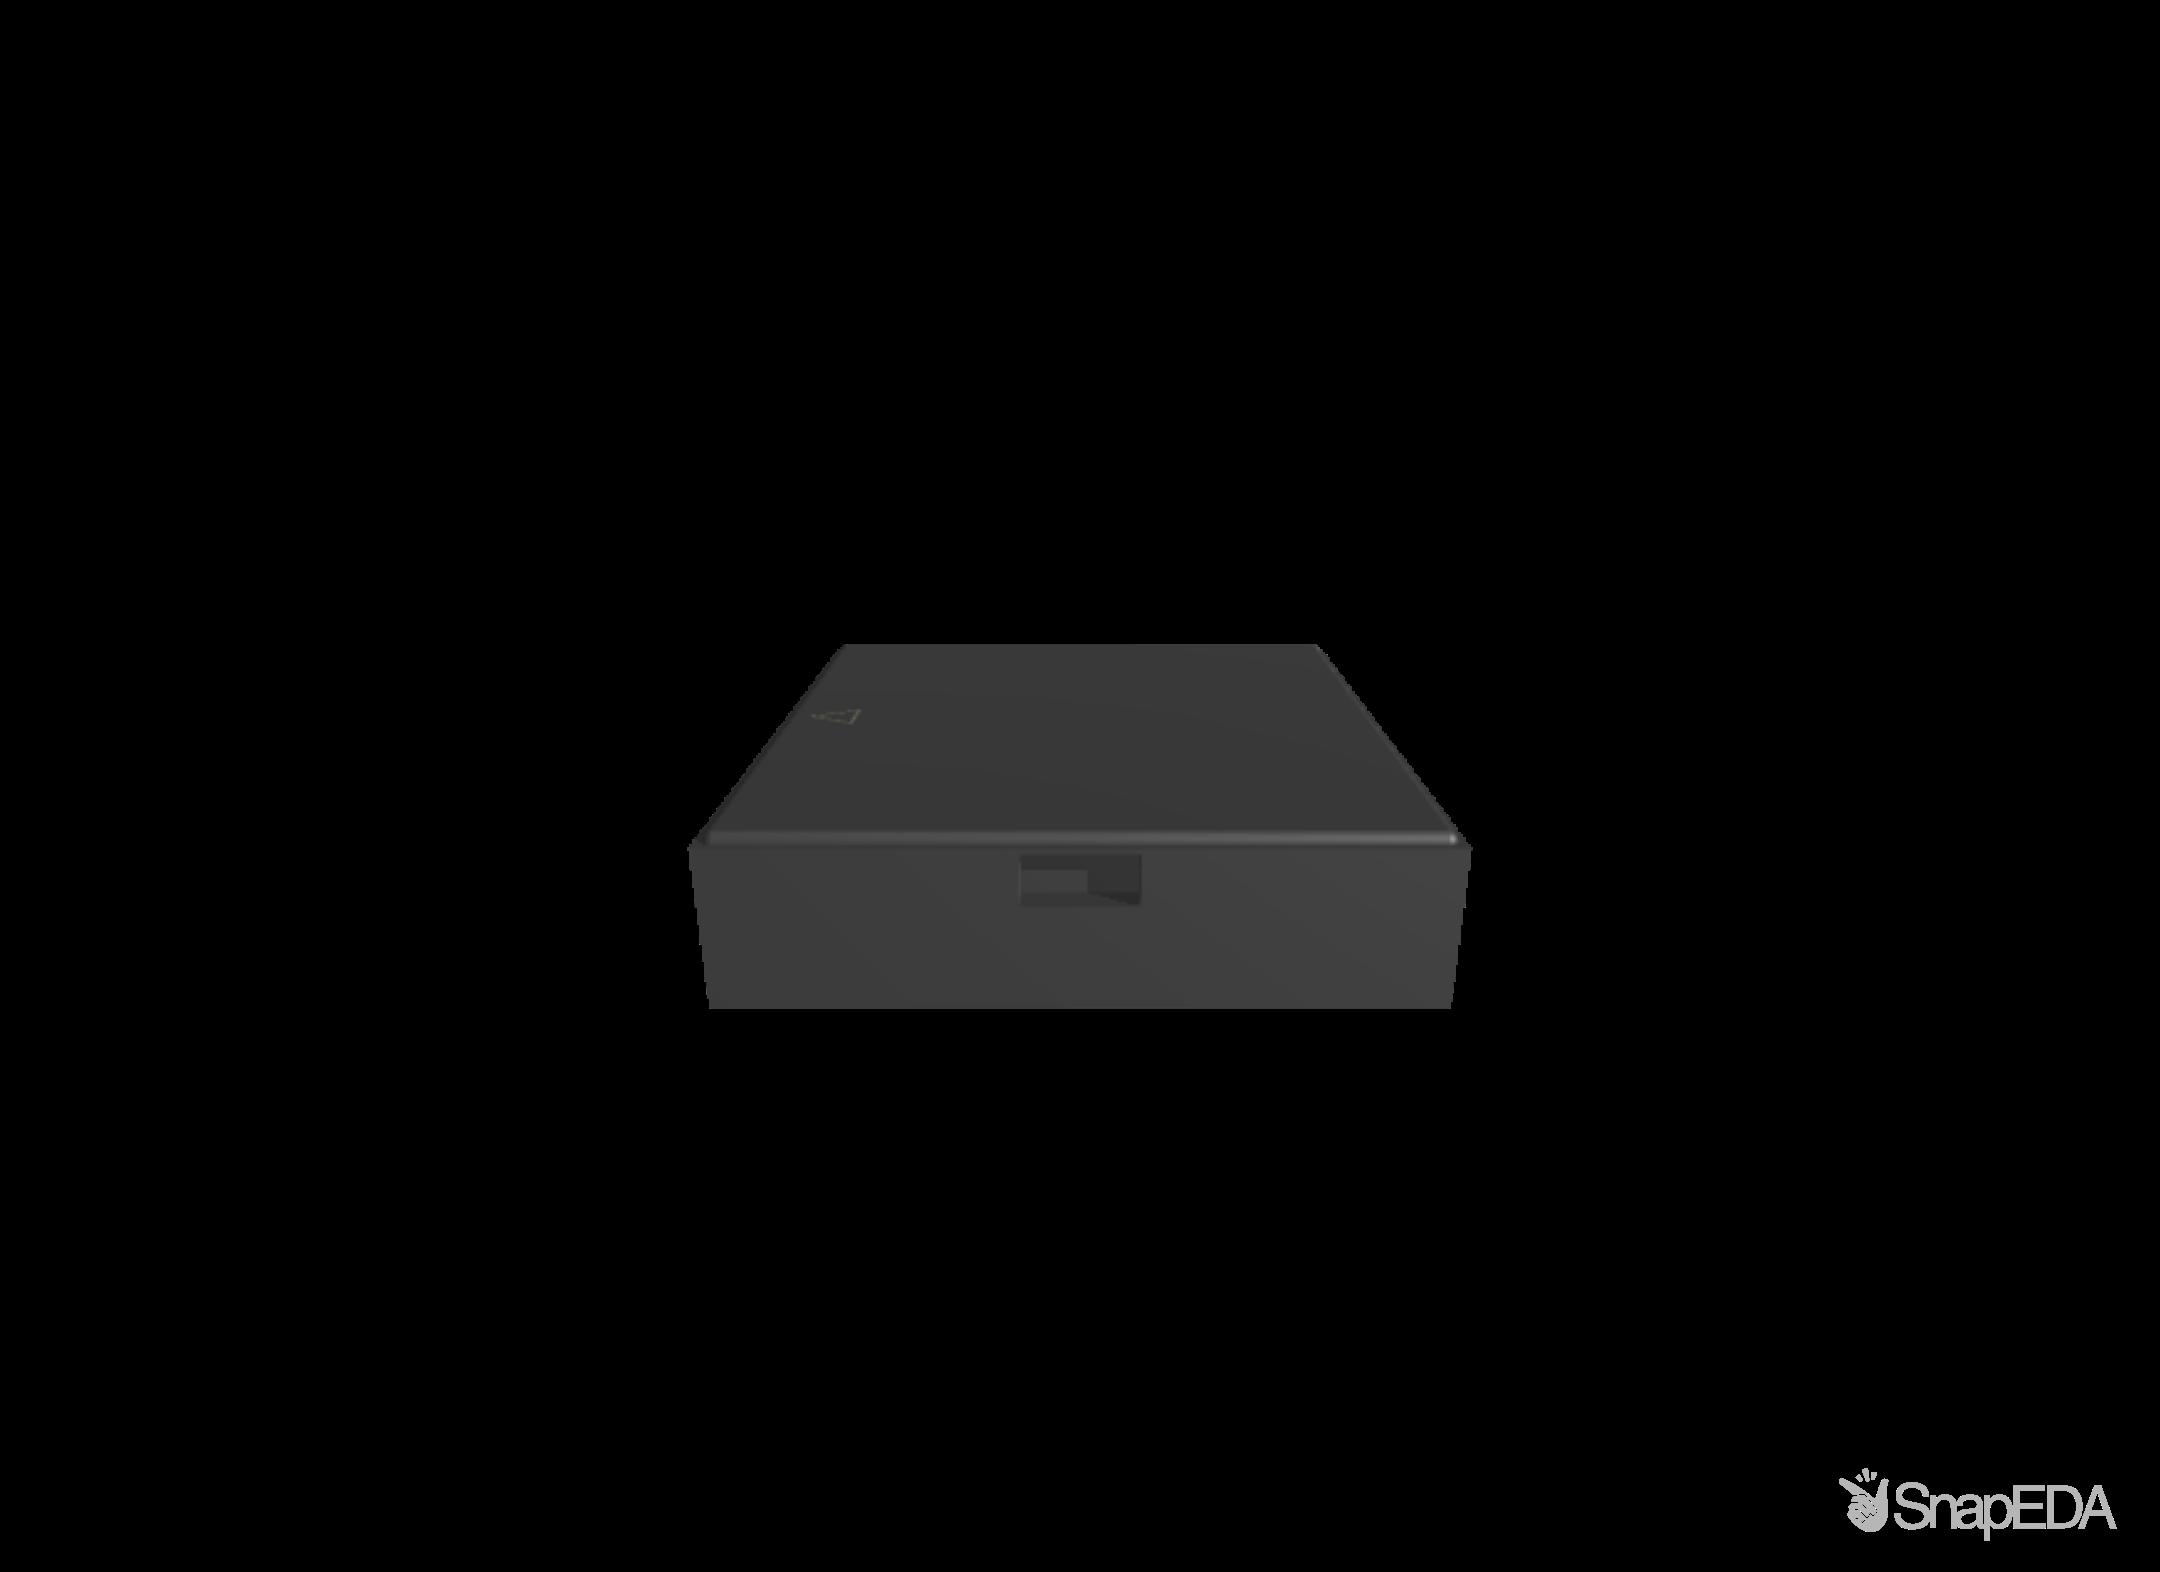 PKLCS1212E4001-R1 3D Model